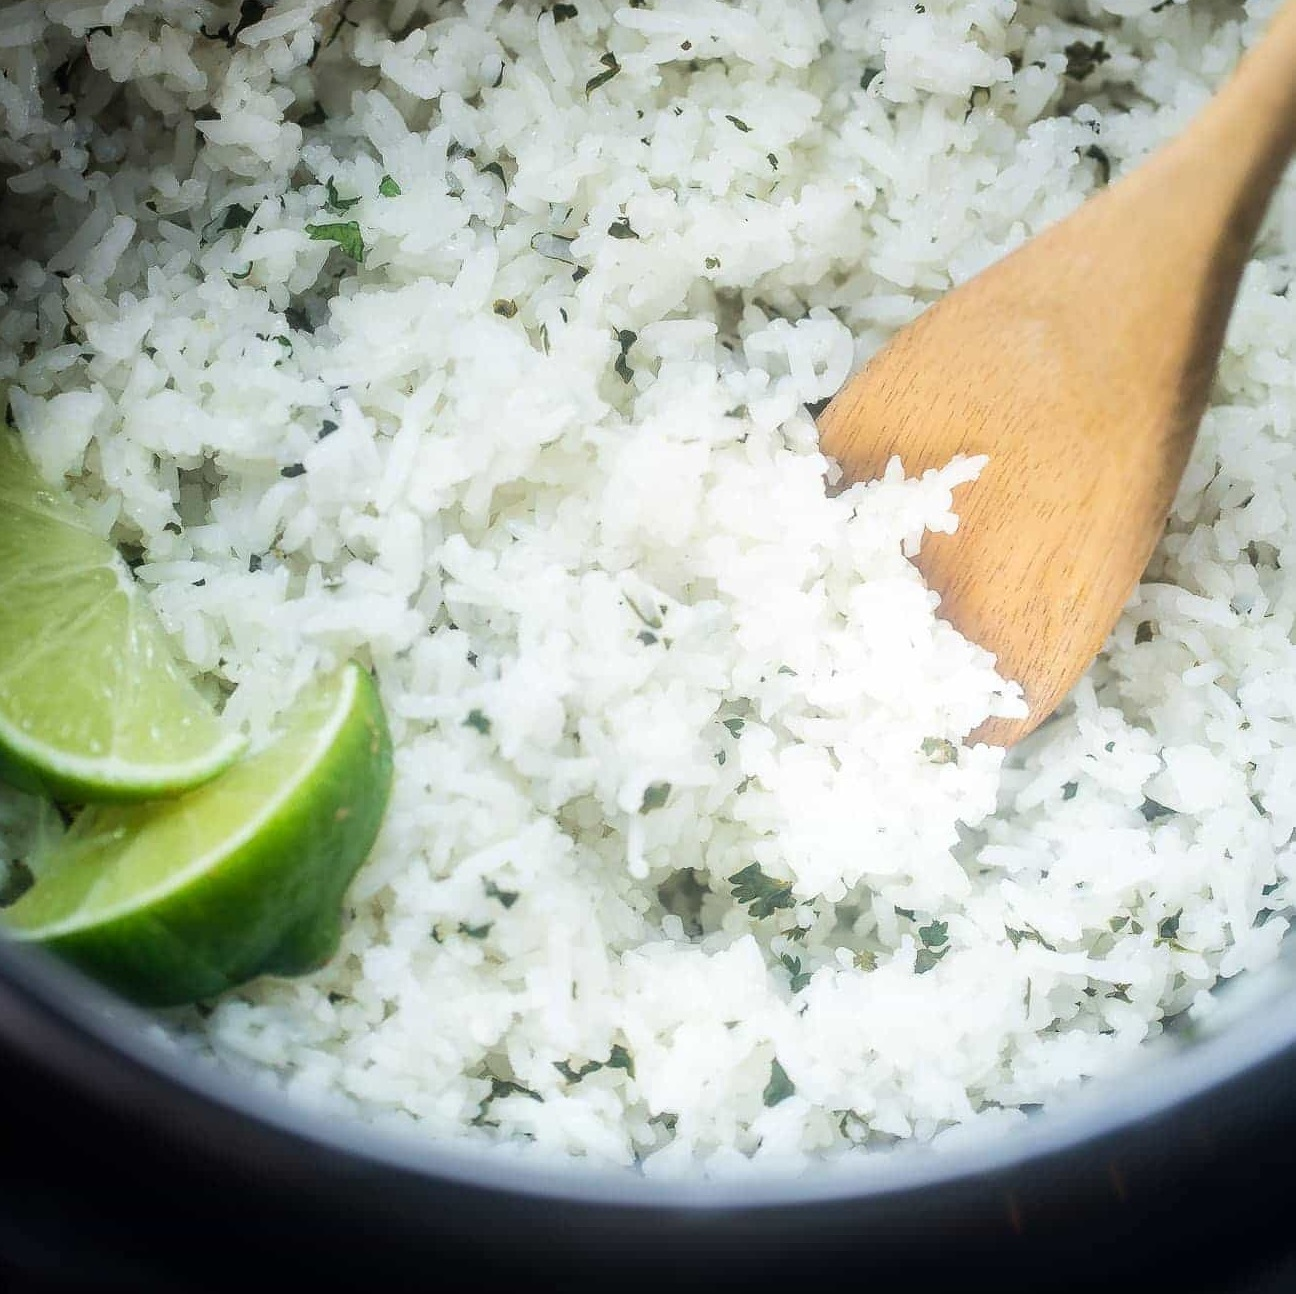 cilantro-lime-instant-pot-rice-pic.jpg